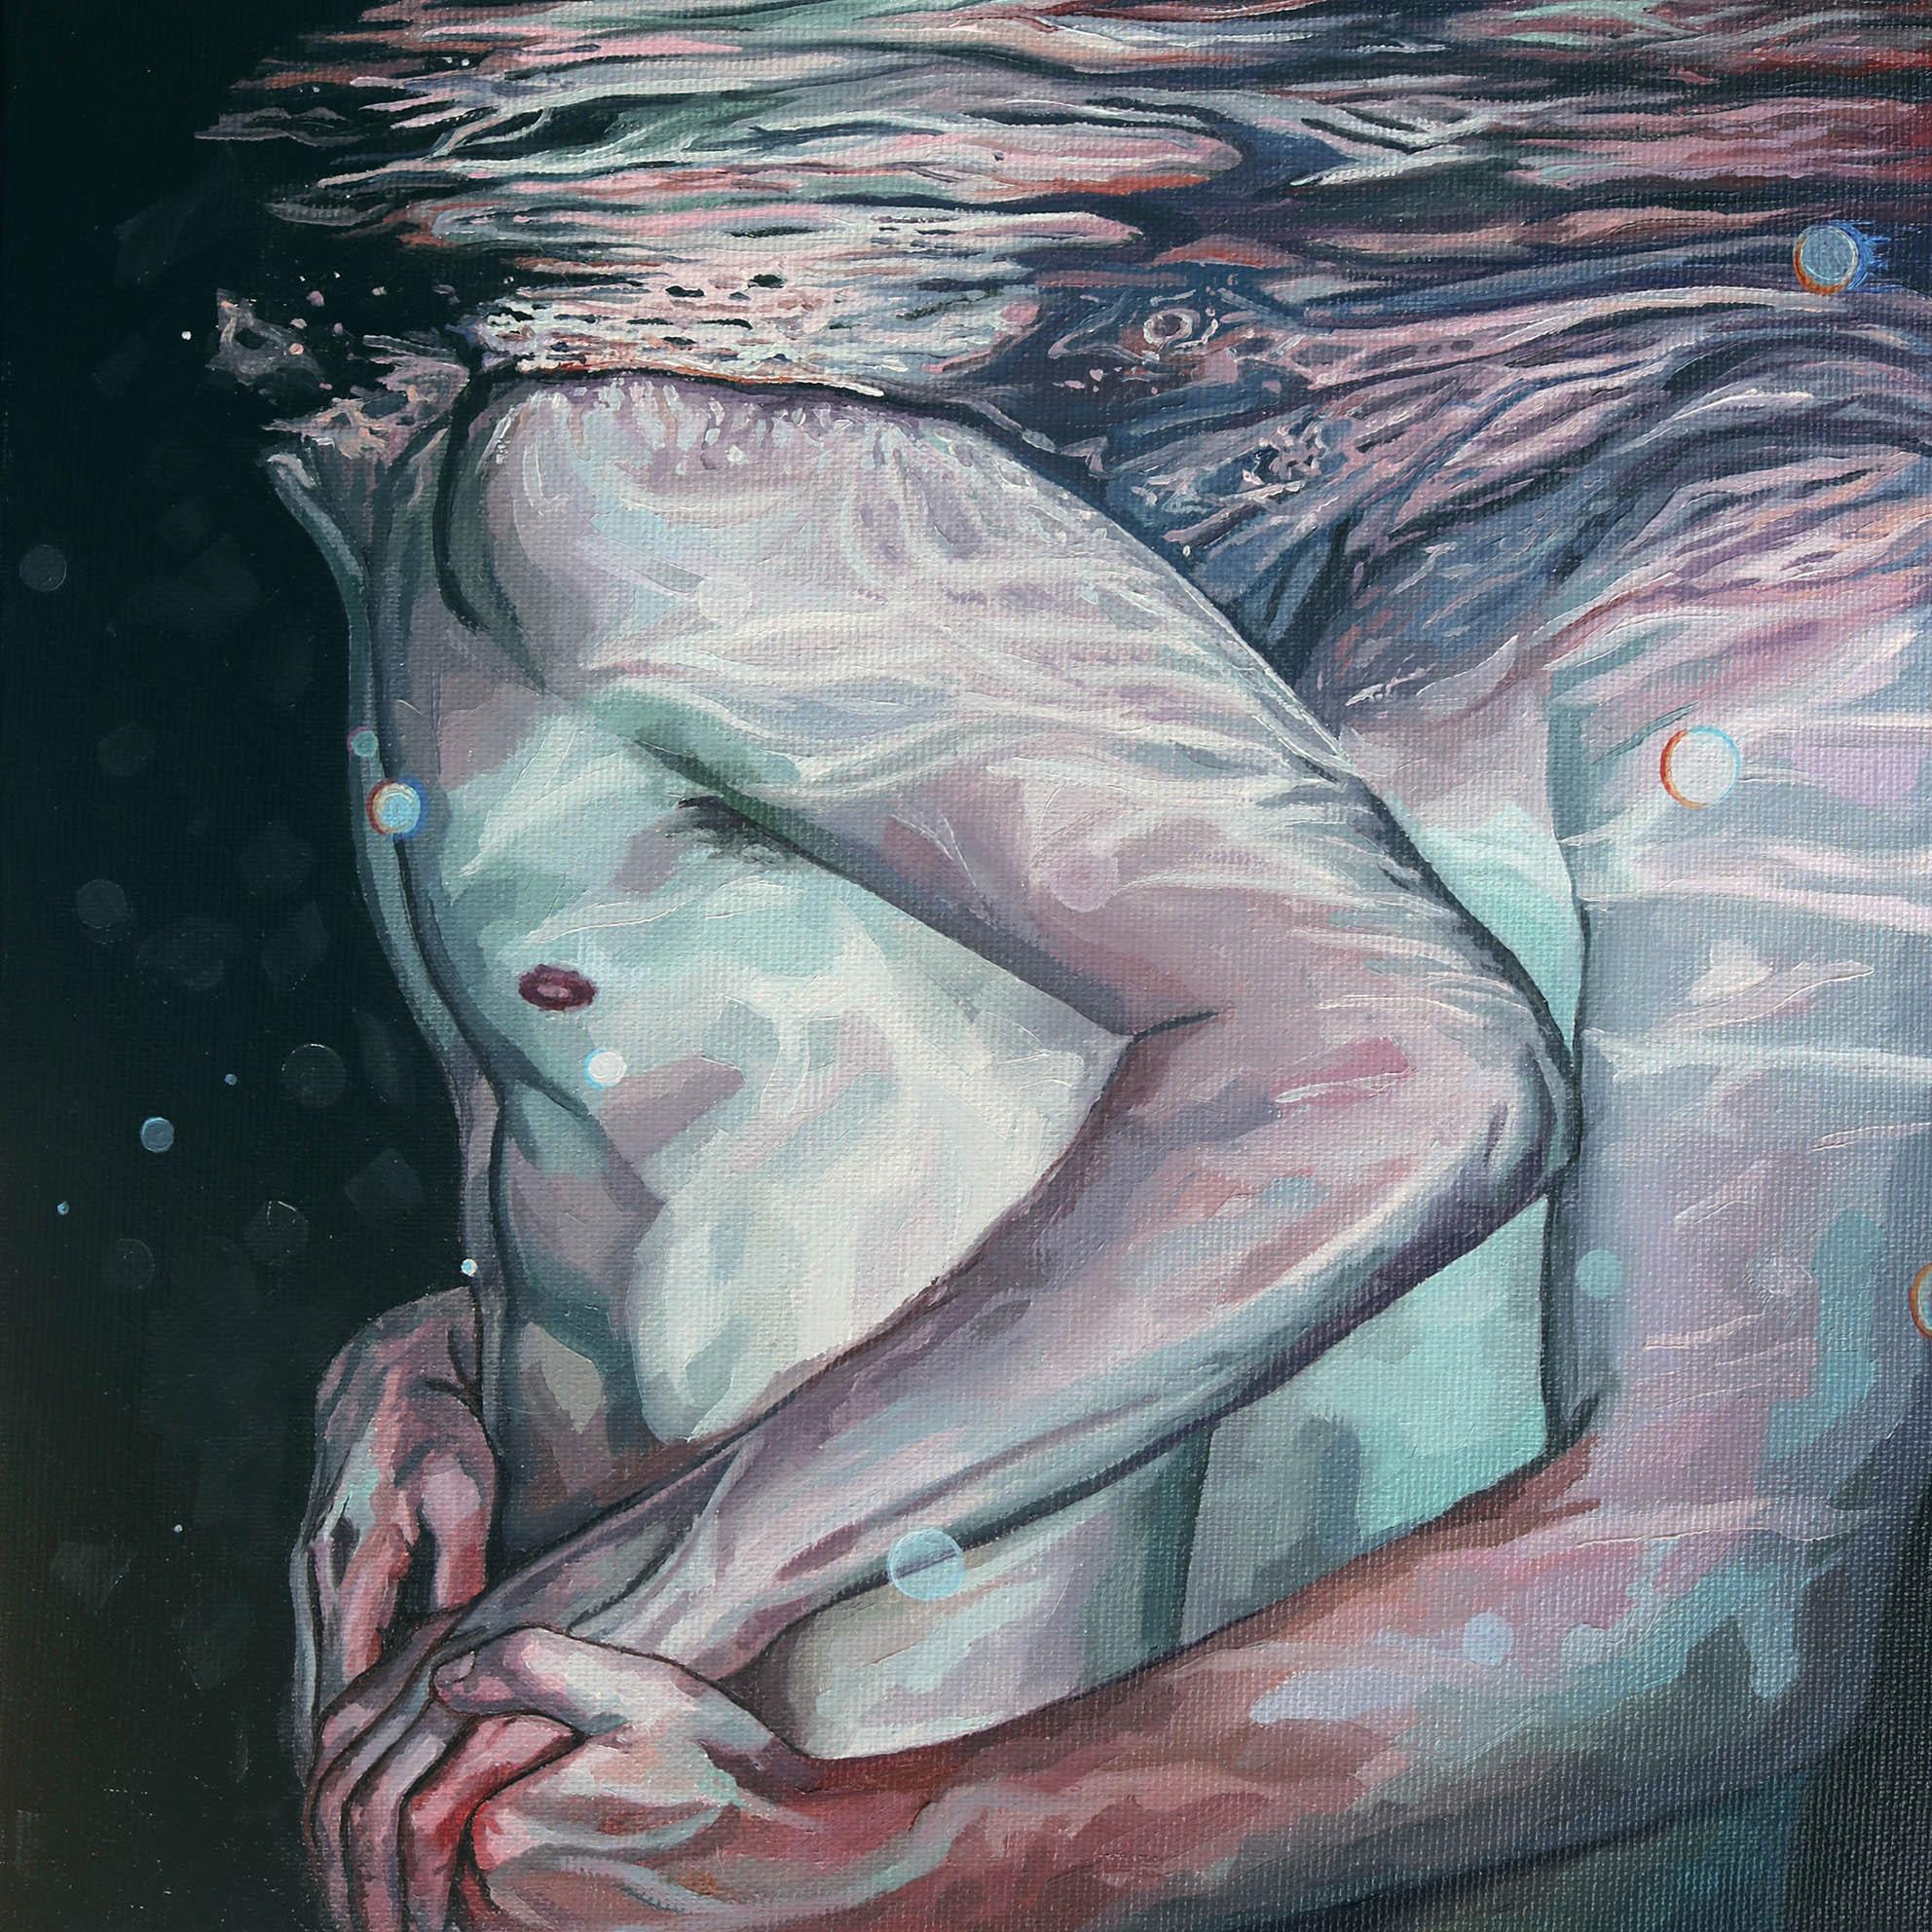 Transparent (2017) - Daniel Jaen